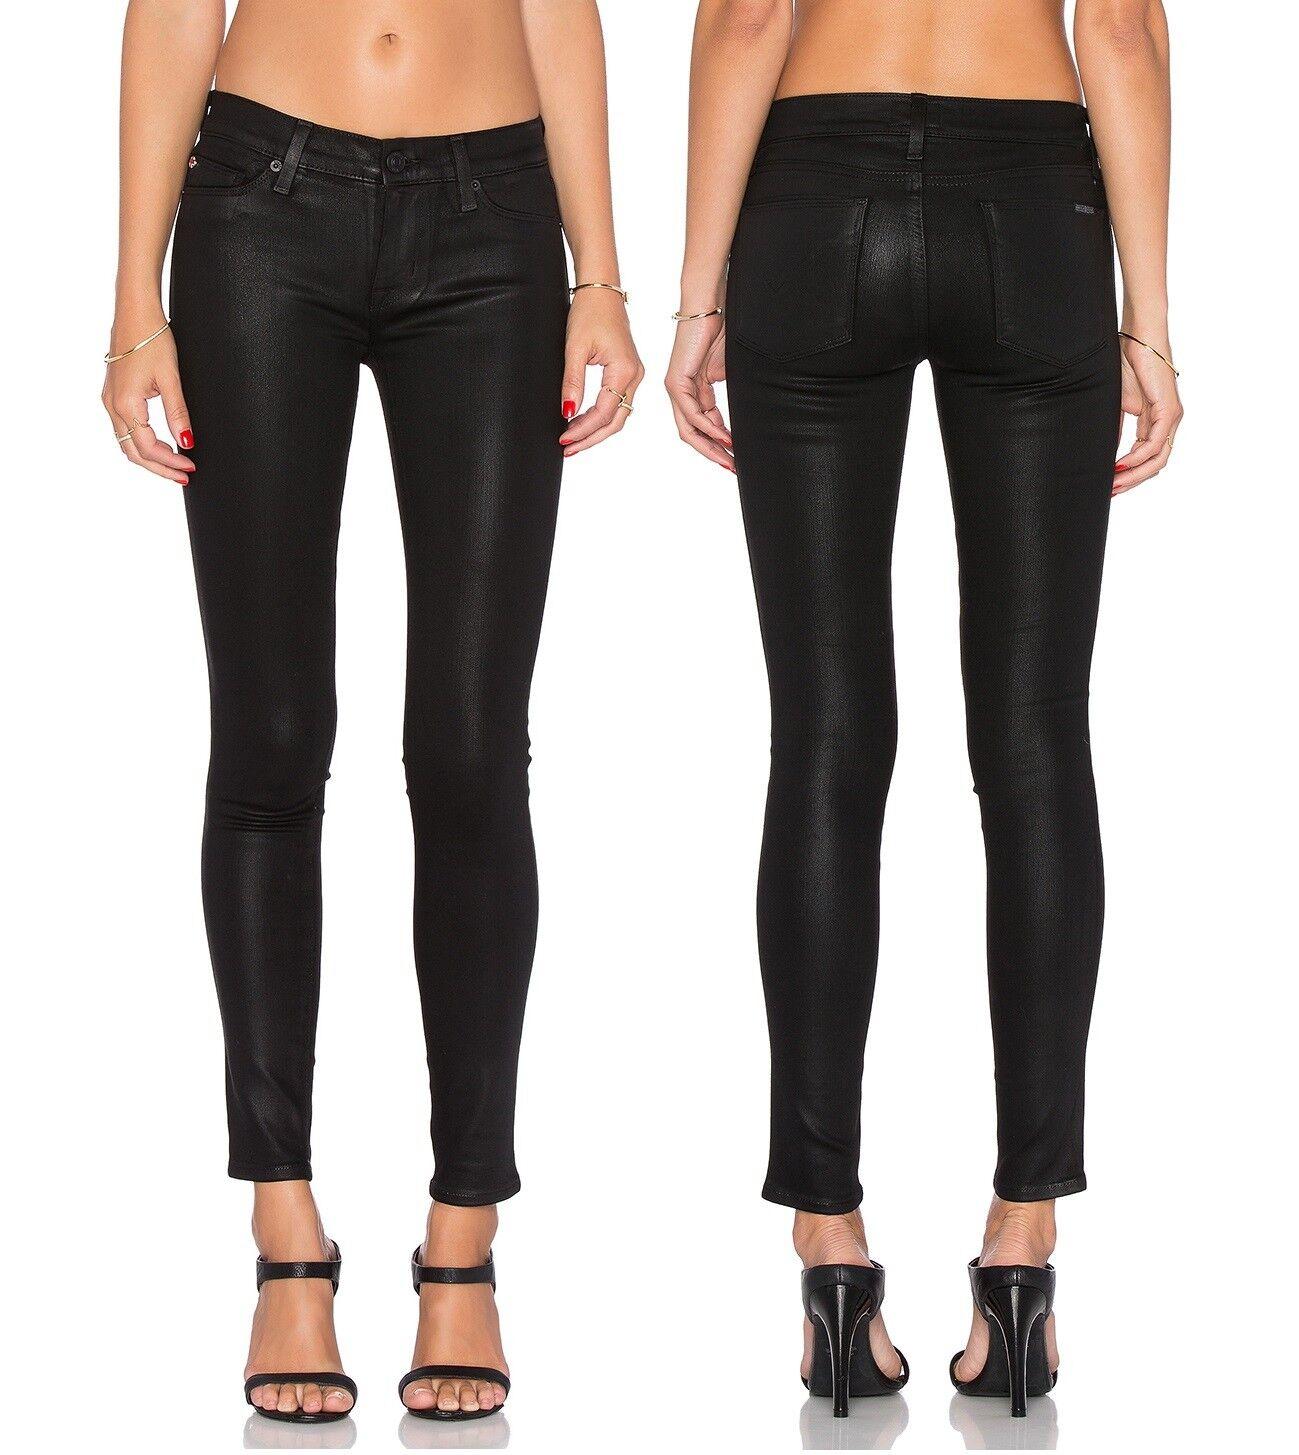 New Hudson Brand damen Krista Faux Leather Super skinny Stretchy Denim Jeans